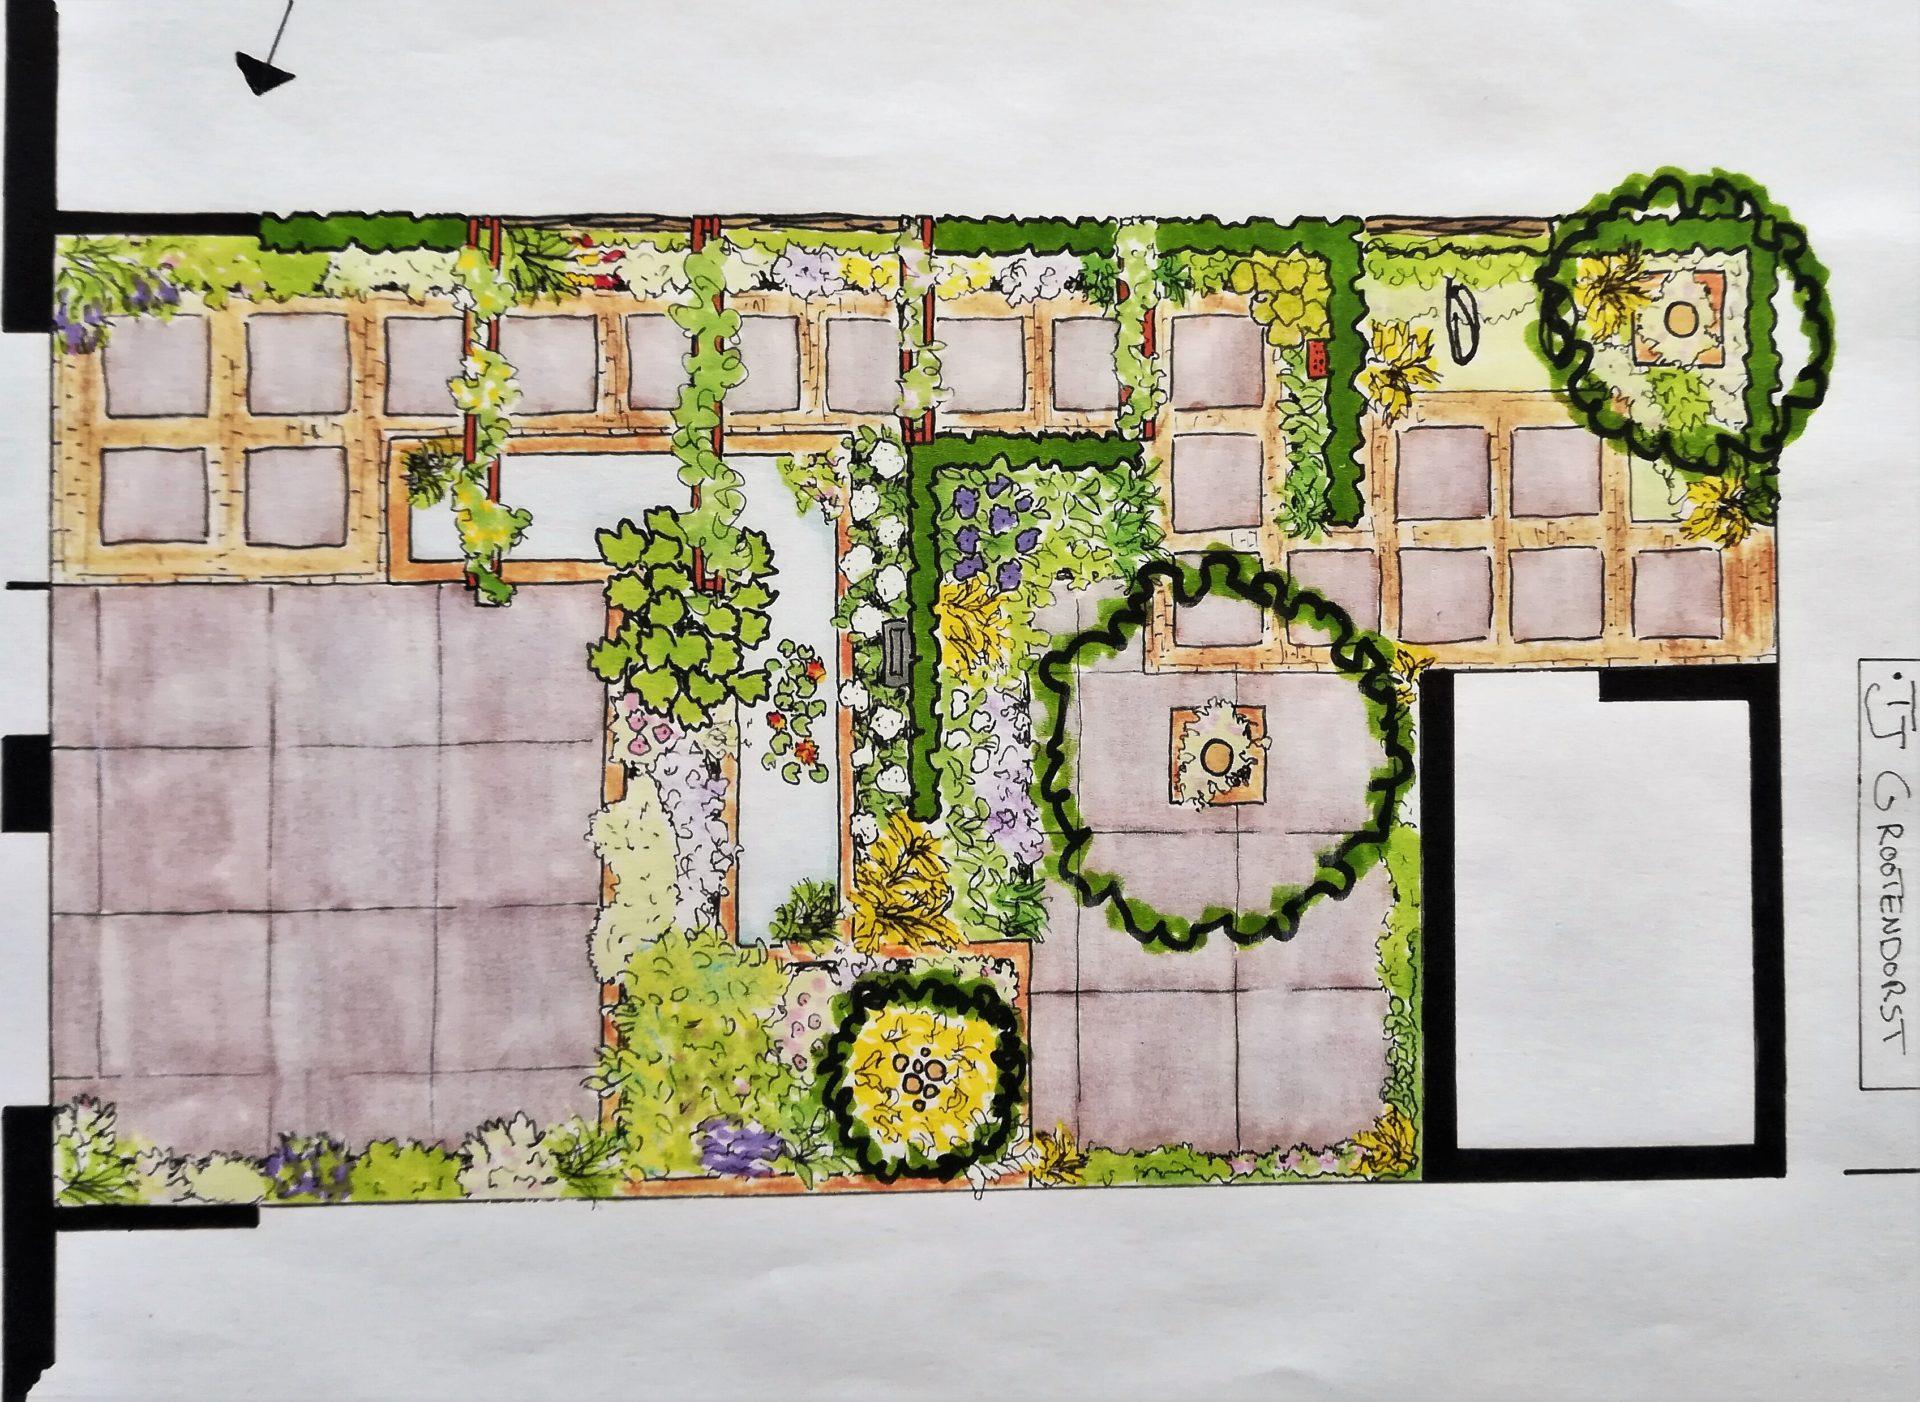 tuinontwerp tuin met vijver